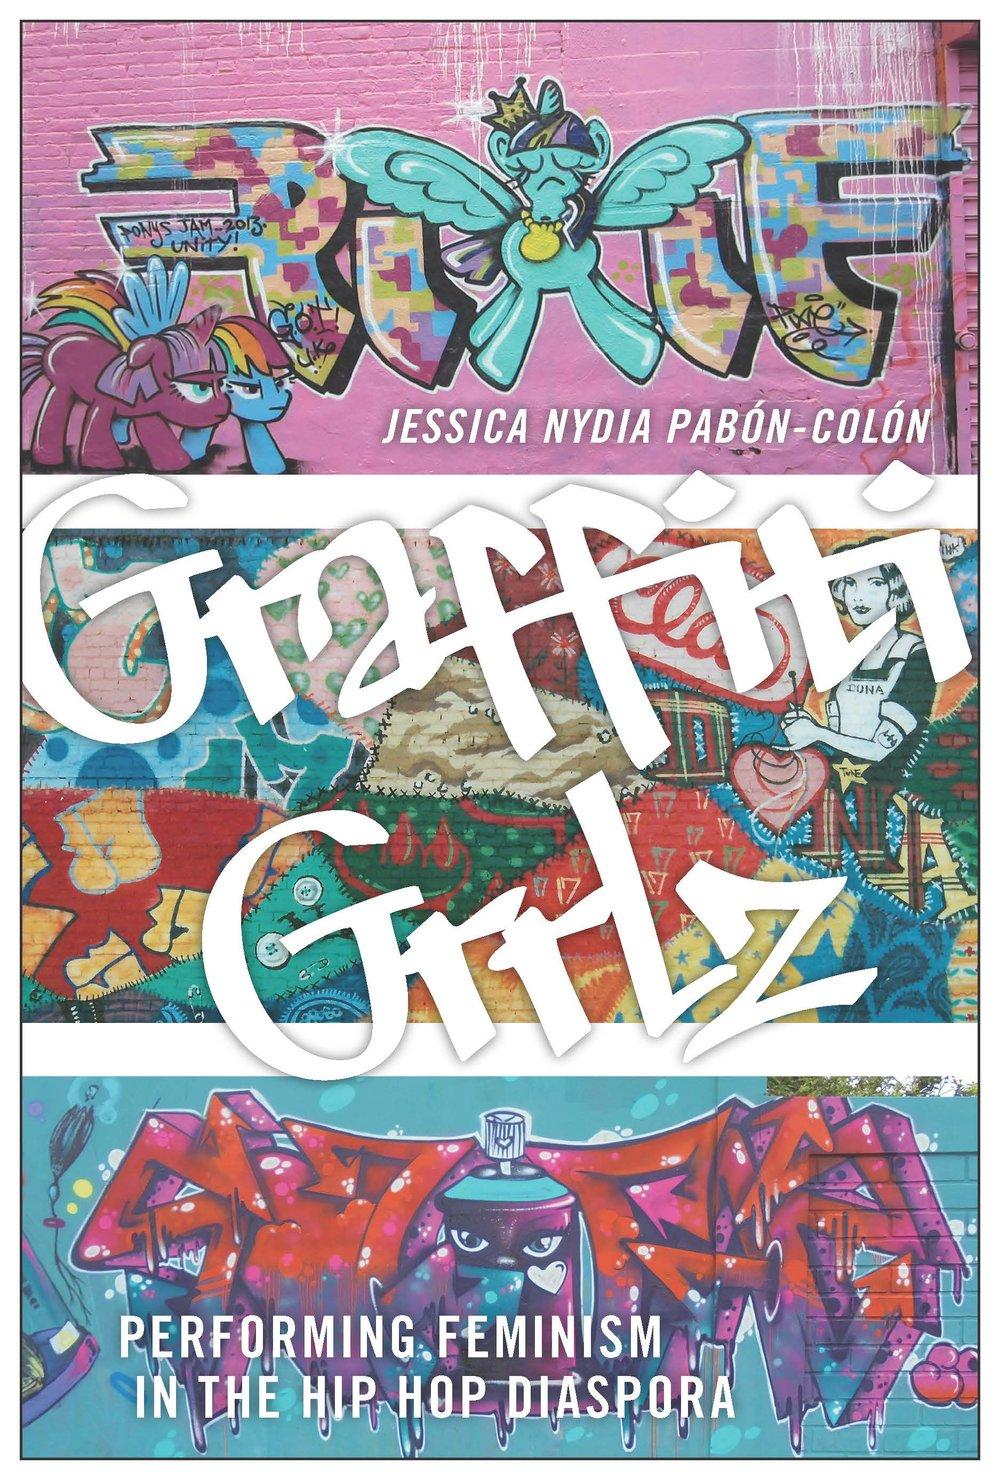 The cover of  Graffiti Grrlz:Performing Feminism in the Hip Hop Diaspora .